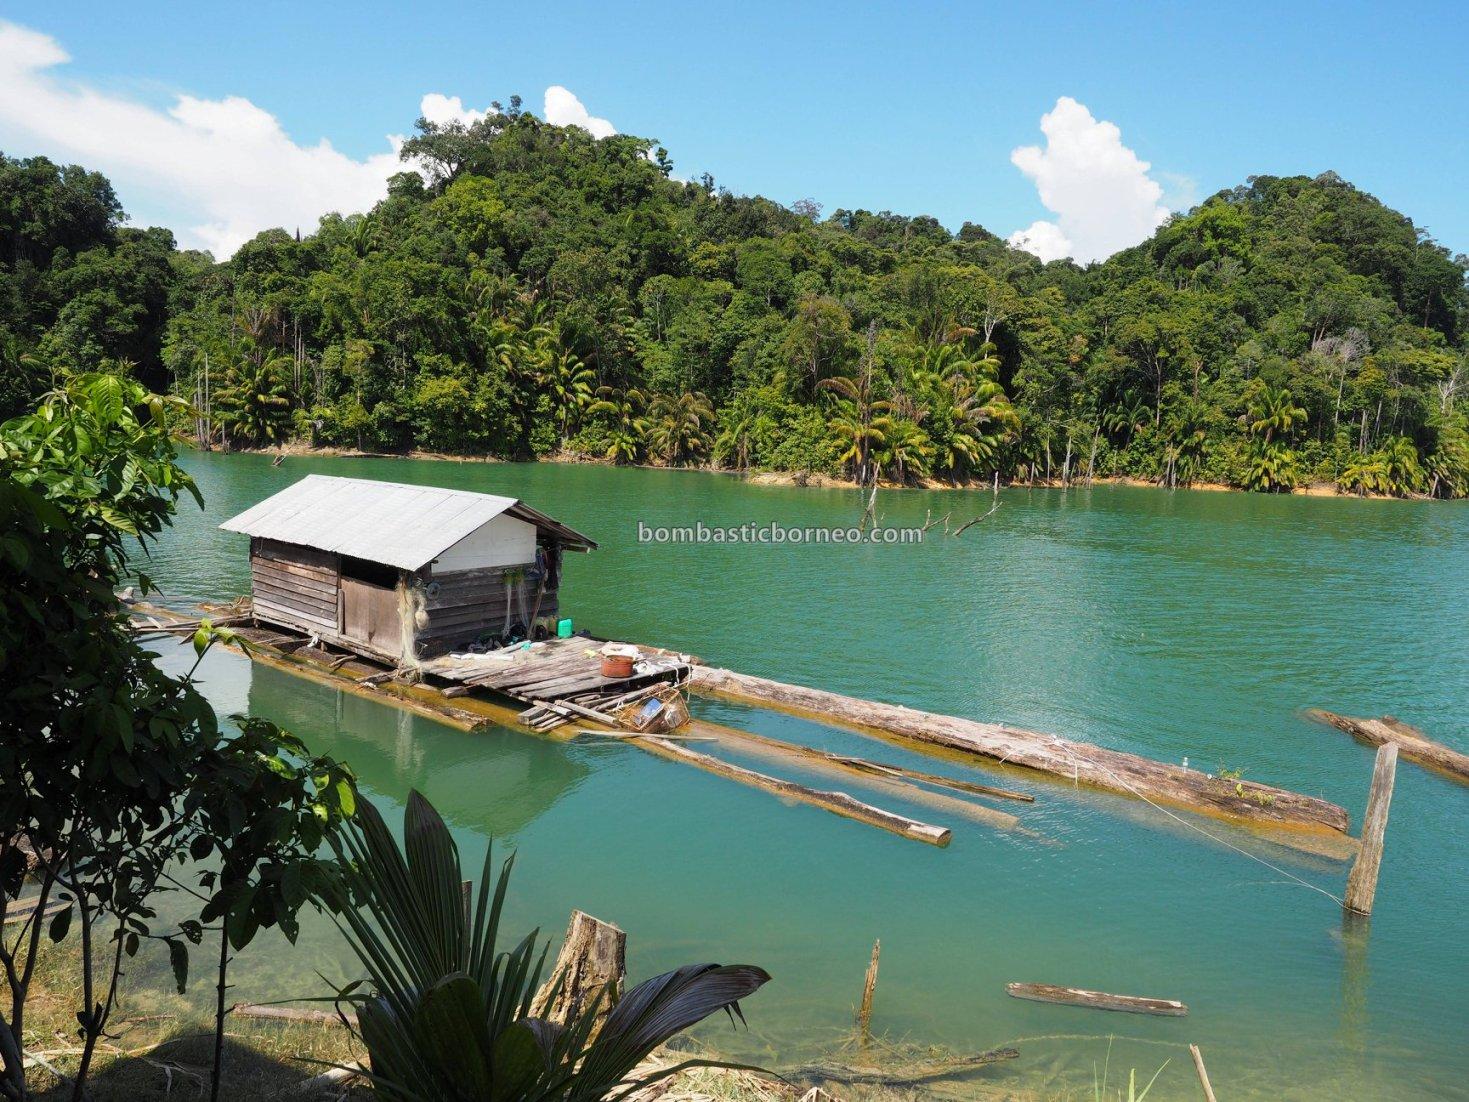 Bakun Hydroelectric Power Dam, empangan, Mebong Cove Villa, destination, fishing trip, chalet, homestay, Belaga, Sarawak, Malaysia, Tourist attraction, travel guide, Trans Border, Borneo, 马来西亚旅游景点